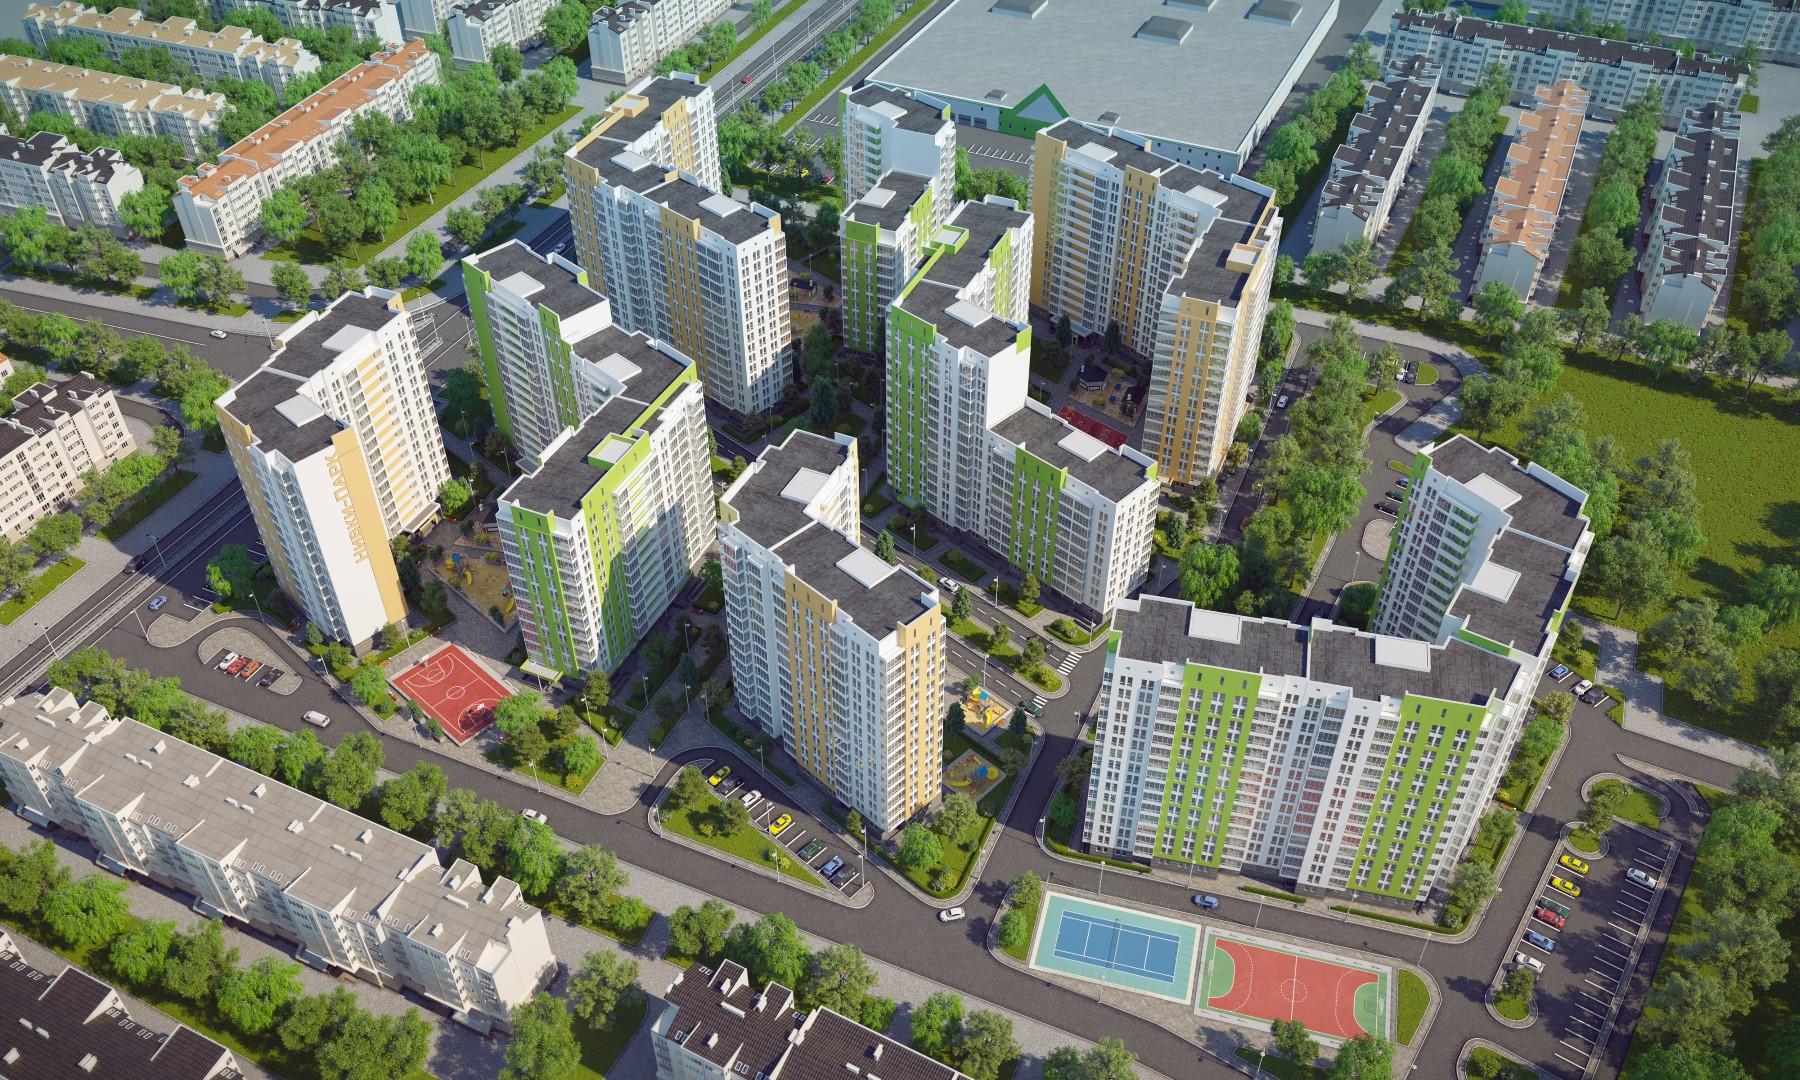 Images of Apartment Complex | 1800x1080